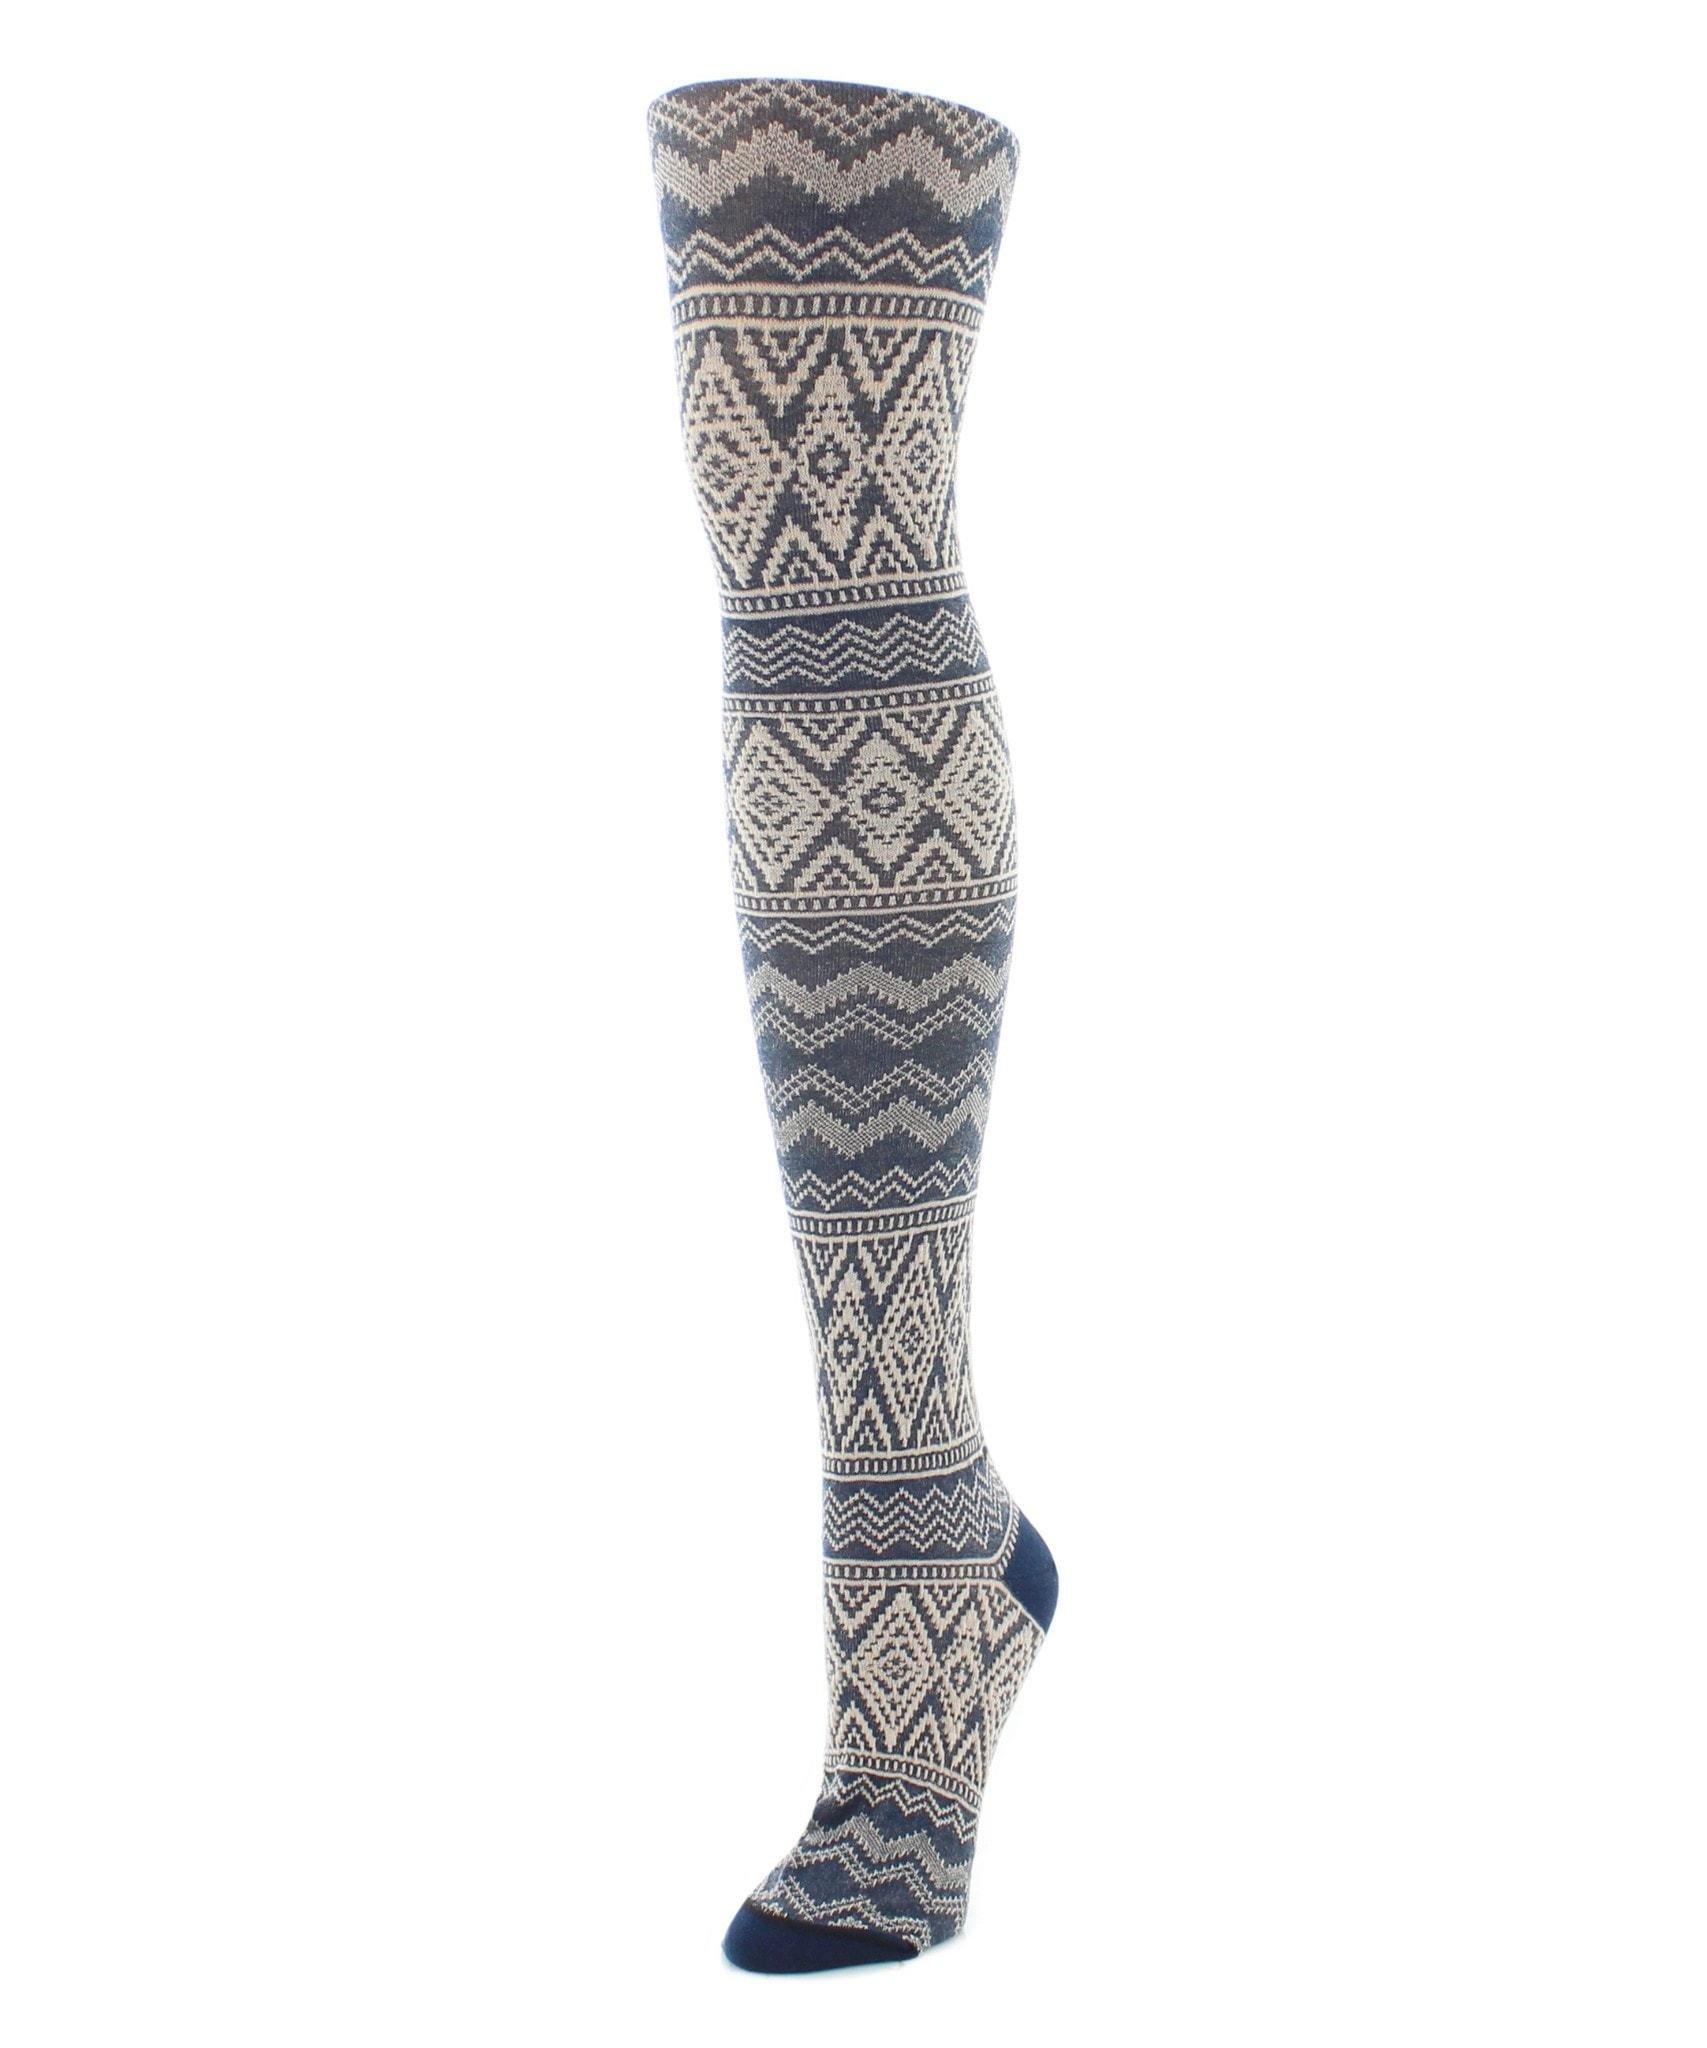 MeMoi Sweater Tights | Patterned Tights | Diamond Fair Isle Navy Blazer MF6 110 Small/Medium